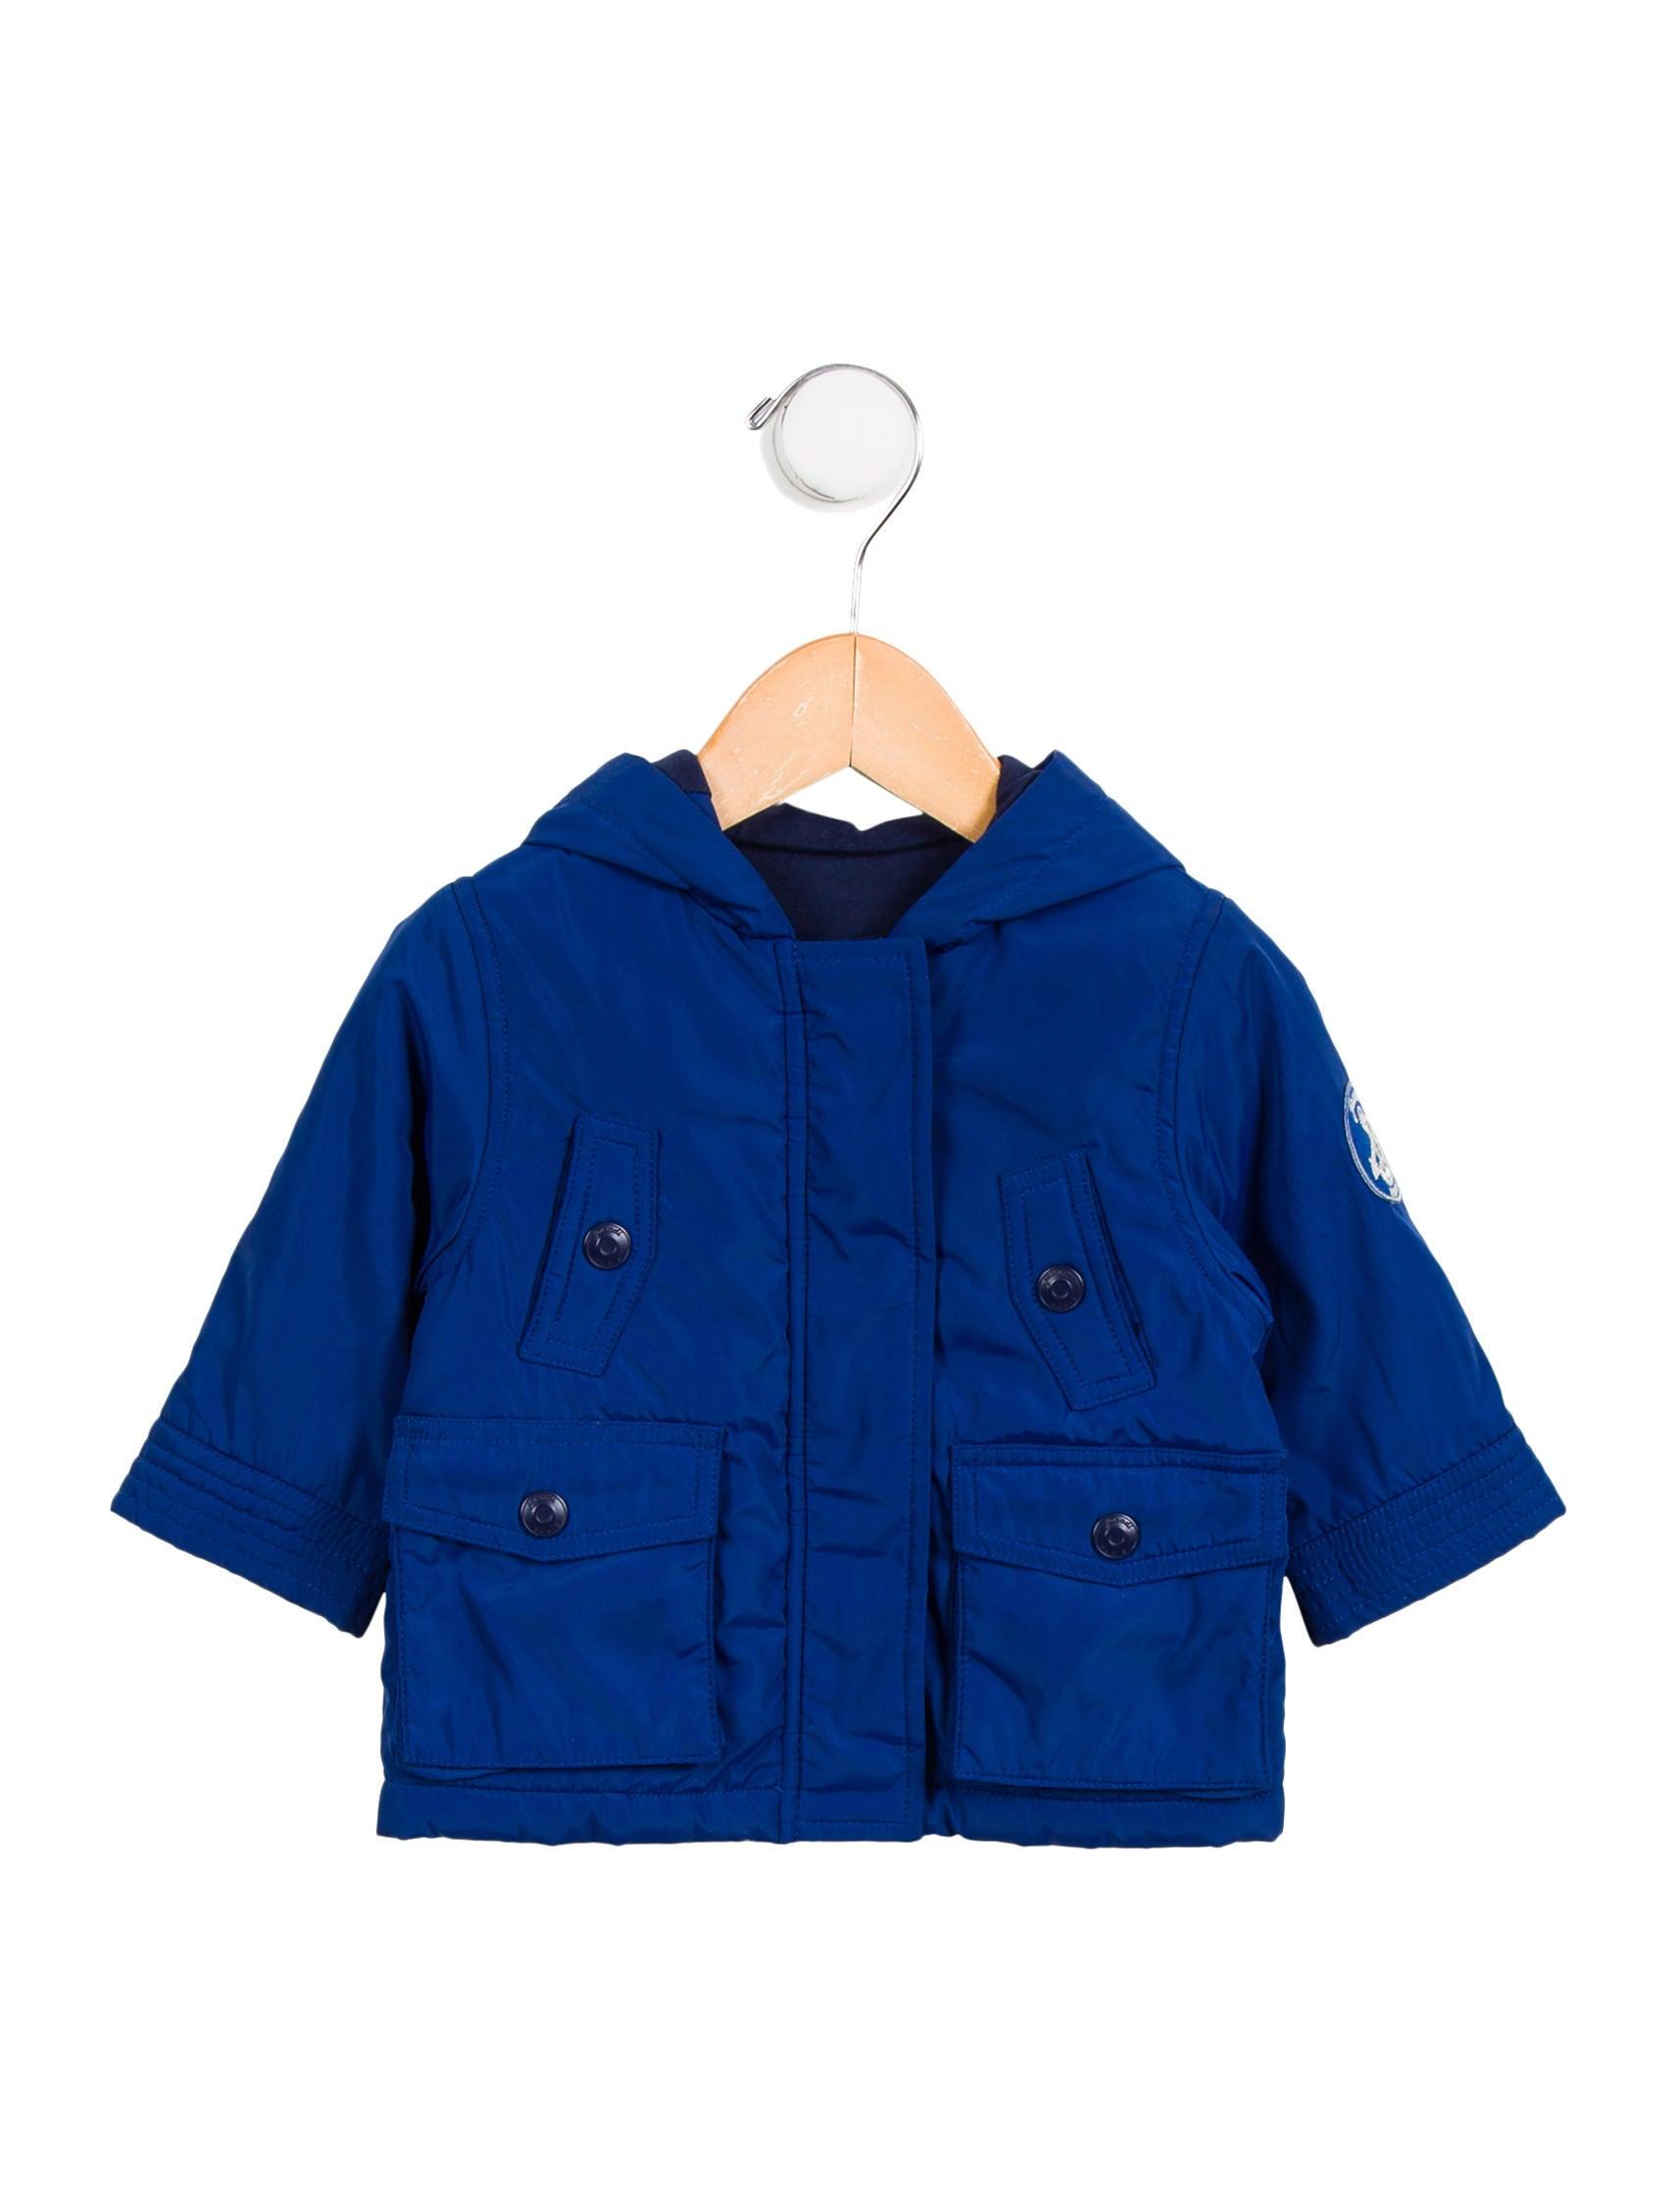 Jacadi Boysu0026#39; Hooded Long Sleeve Jacket - Baby Gear - WJDCI21126   The RealReal